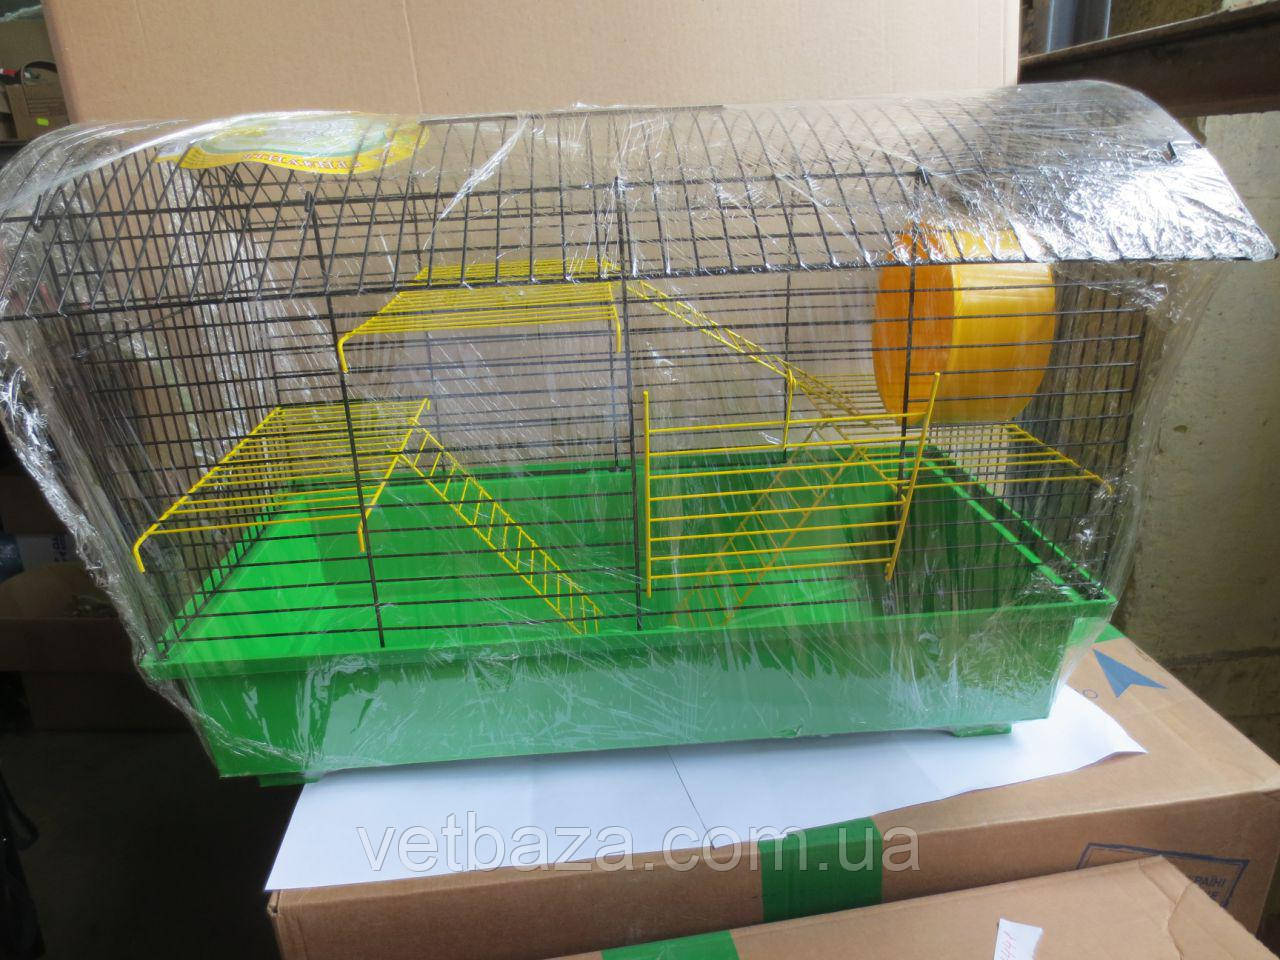 Клетка Биг-Вагон для грызунов крашенная 61х40х40 Лори (100% предоплата)